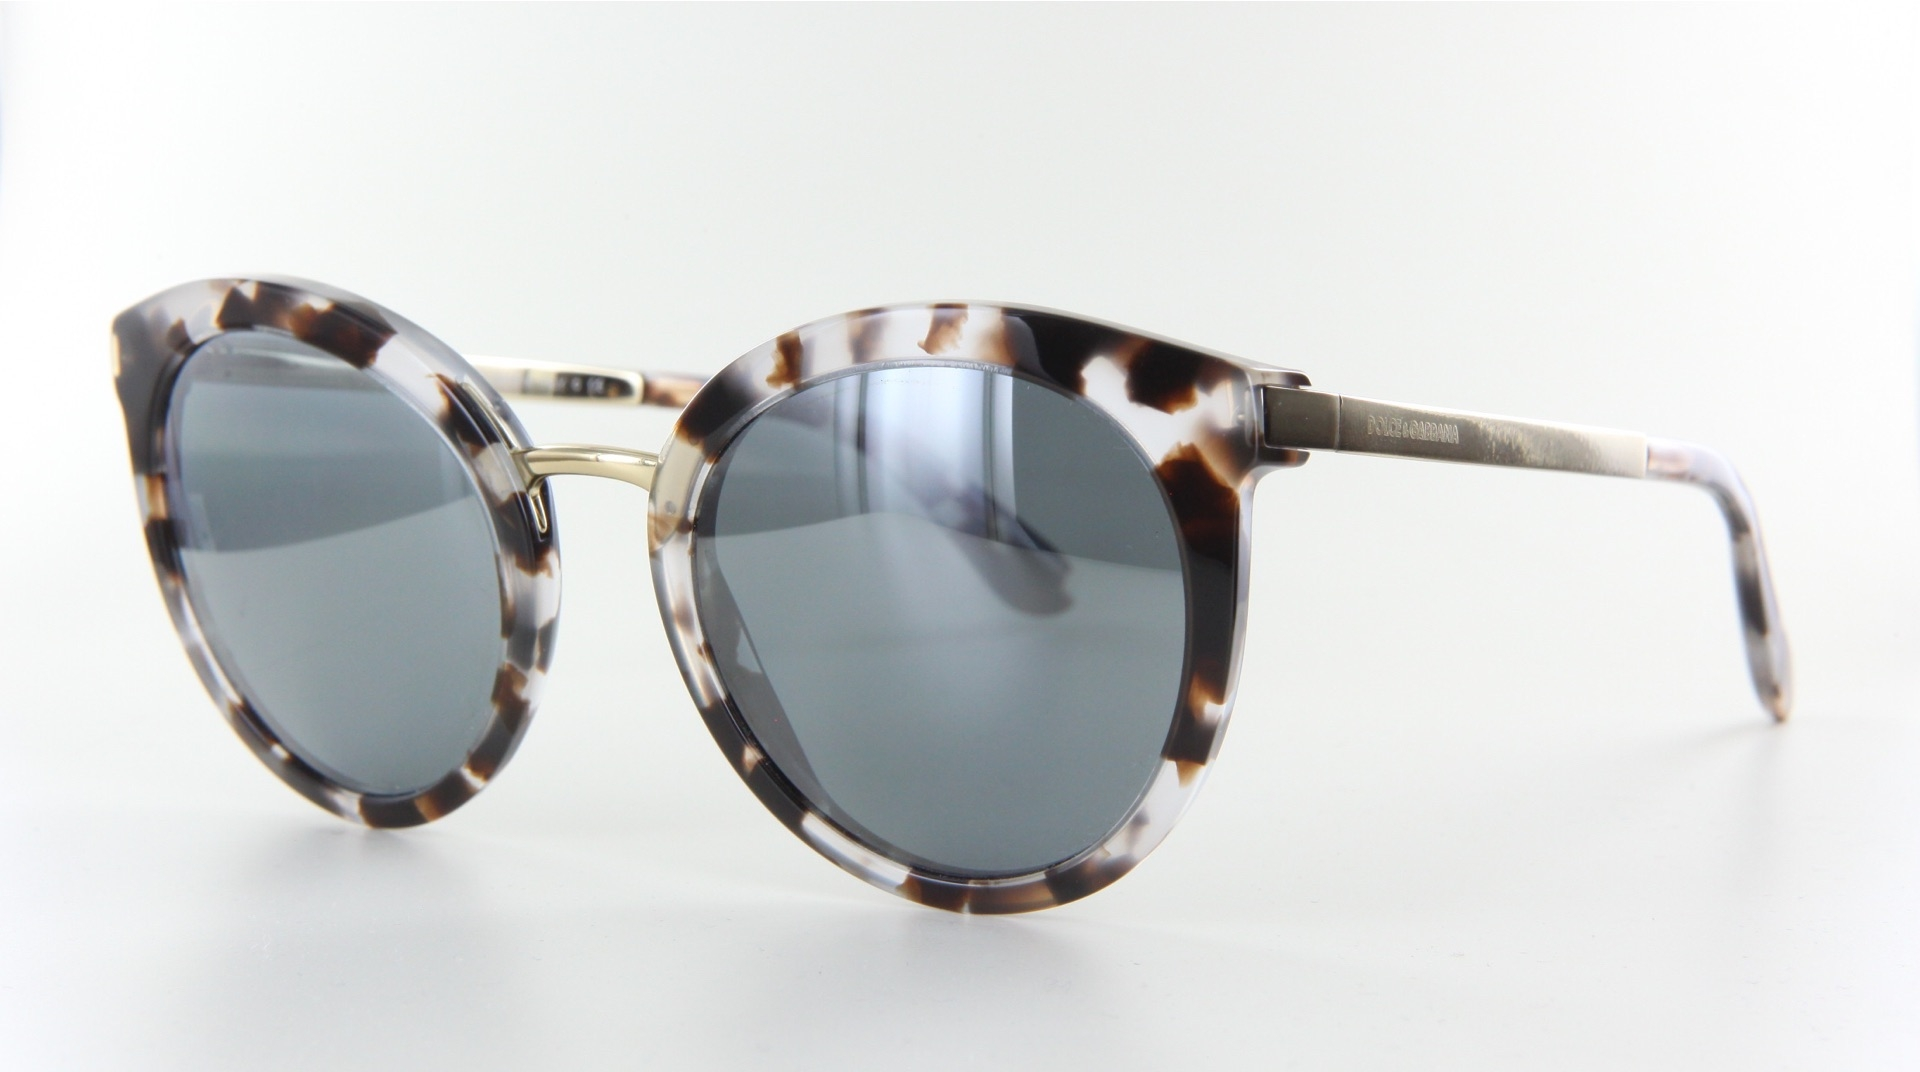 Dolce & Gabbana - ref: 74943